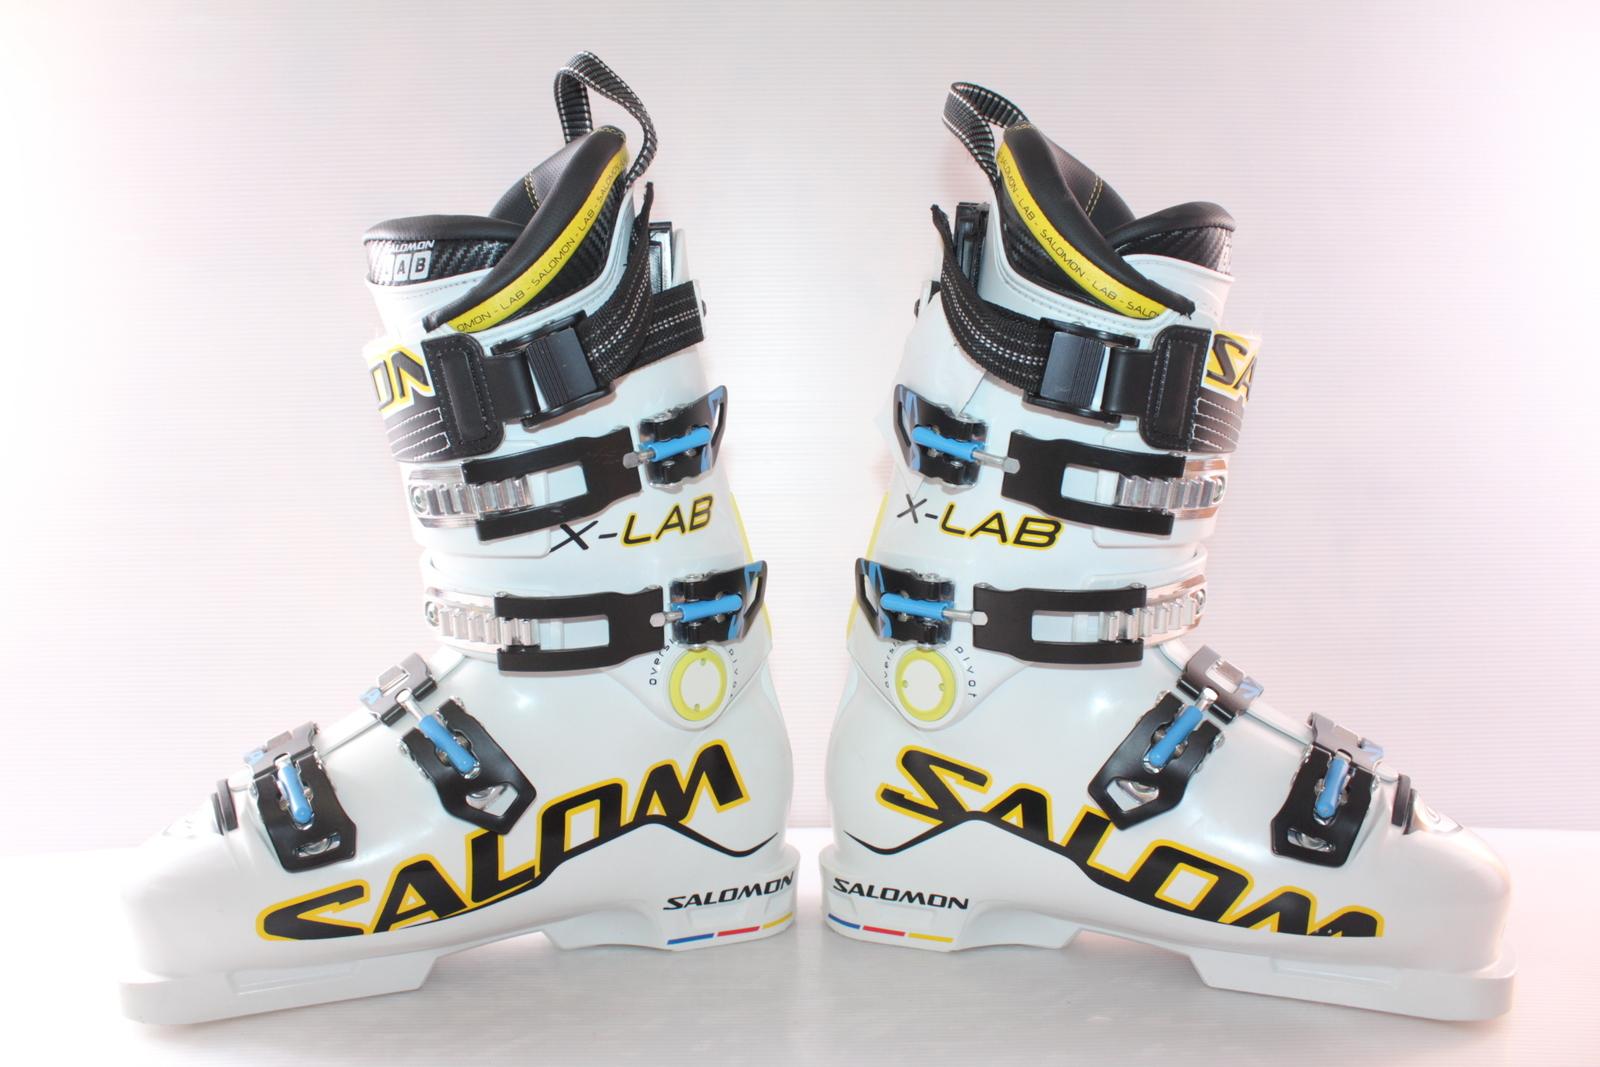 Lyžařské boty Salomon X-Lab vel. EU41 flexe 130